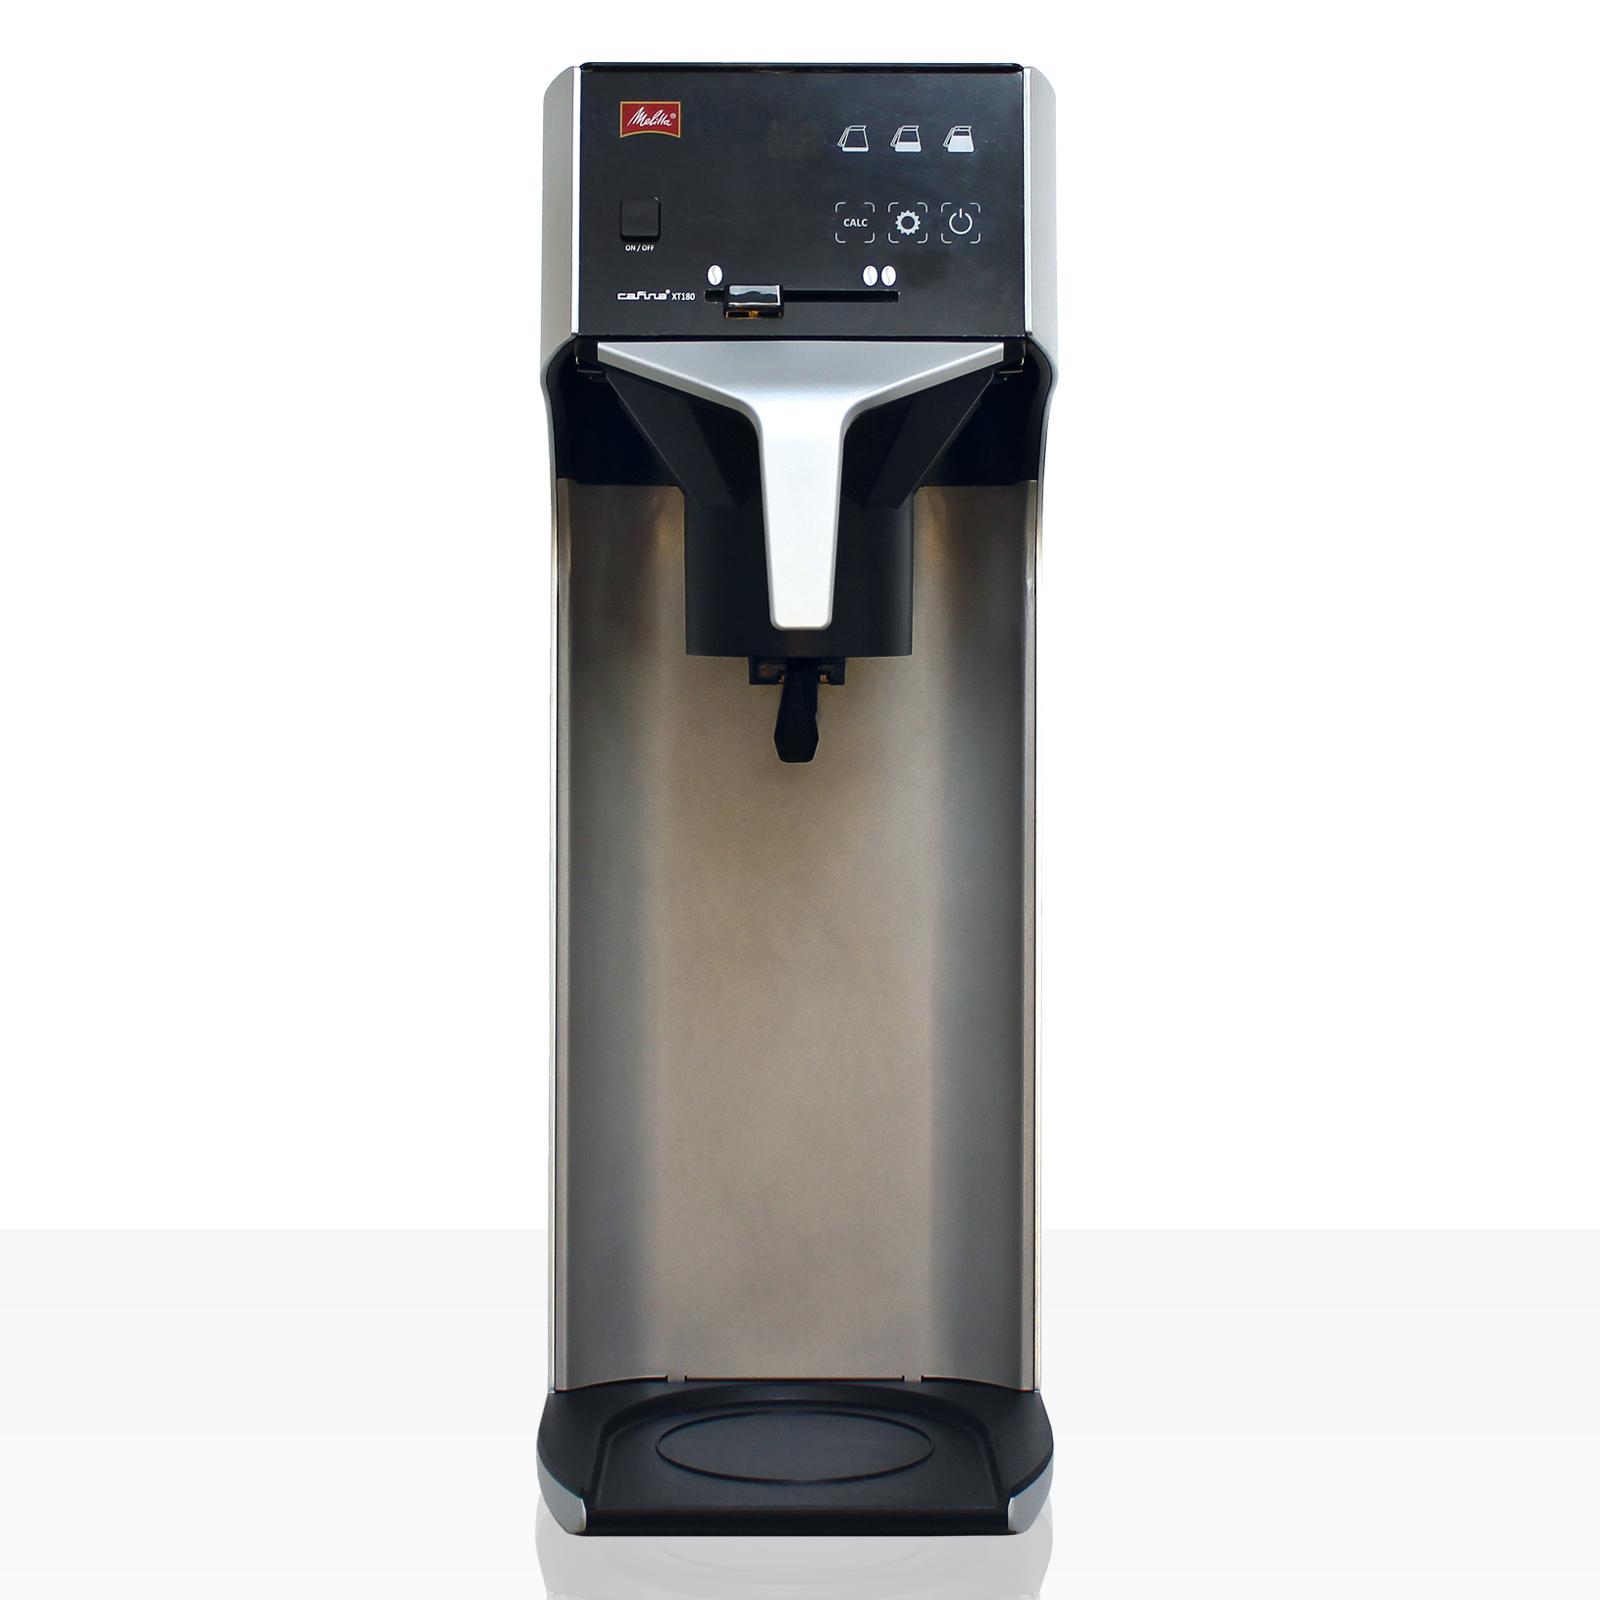 Melitta Cafina XT180 TMC Filter-Kaffeemaschine mit Wassertank (inkl. Kanne 2,2l mit Glaskolben)